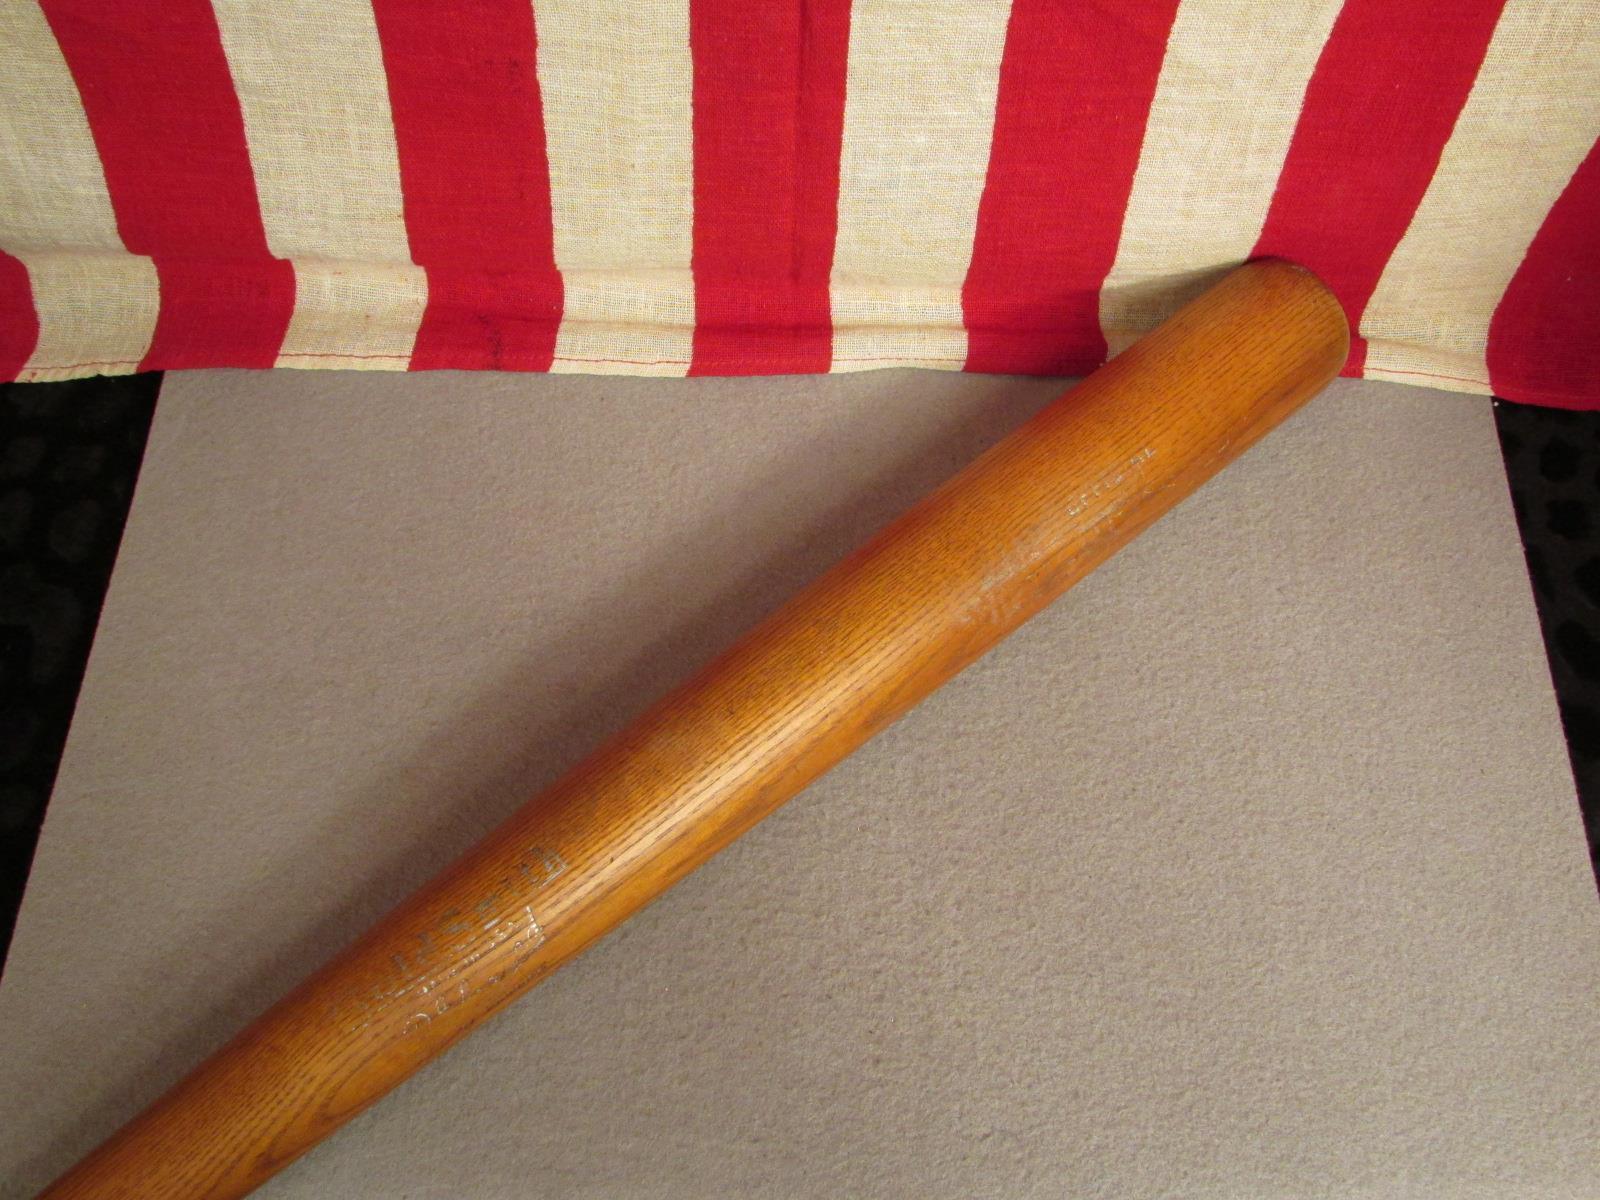 Vintage Goldsmith Holz Baseball Schläger 'Bevorzugt' No.24L No.24L 'Bevorzugt' Offizielles 33